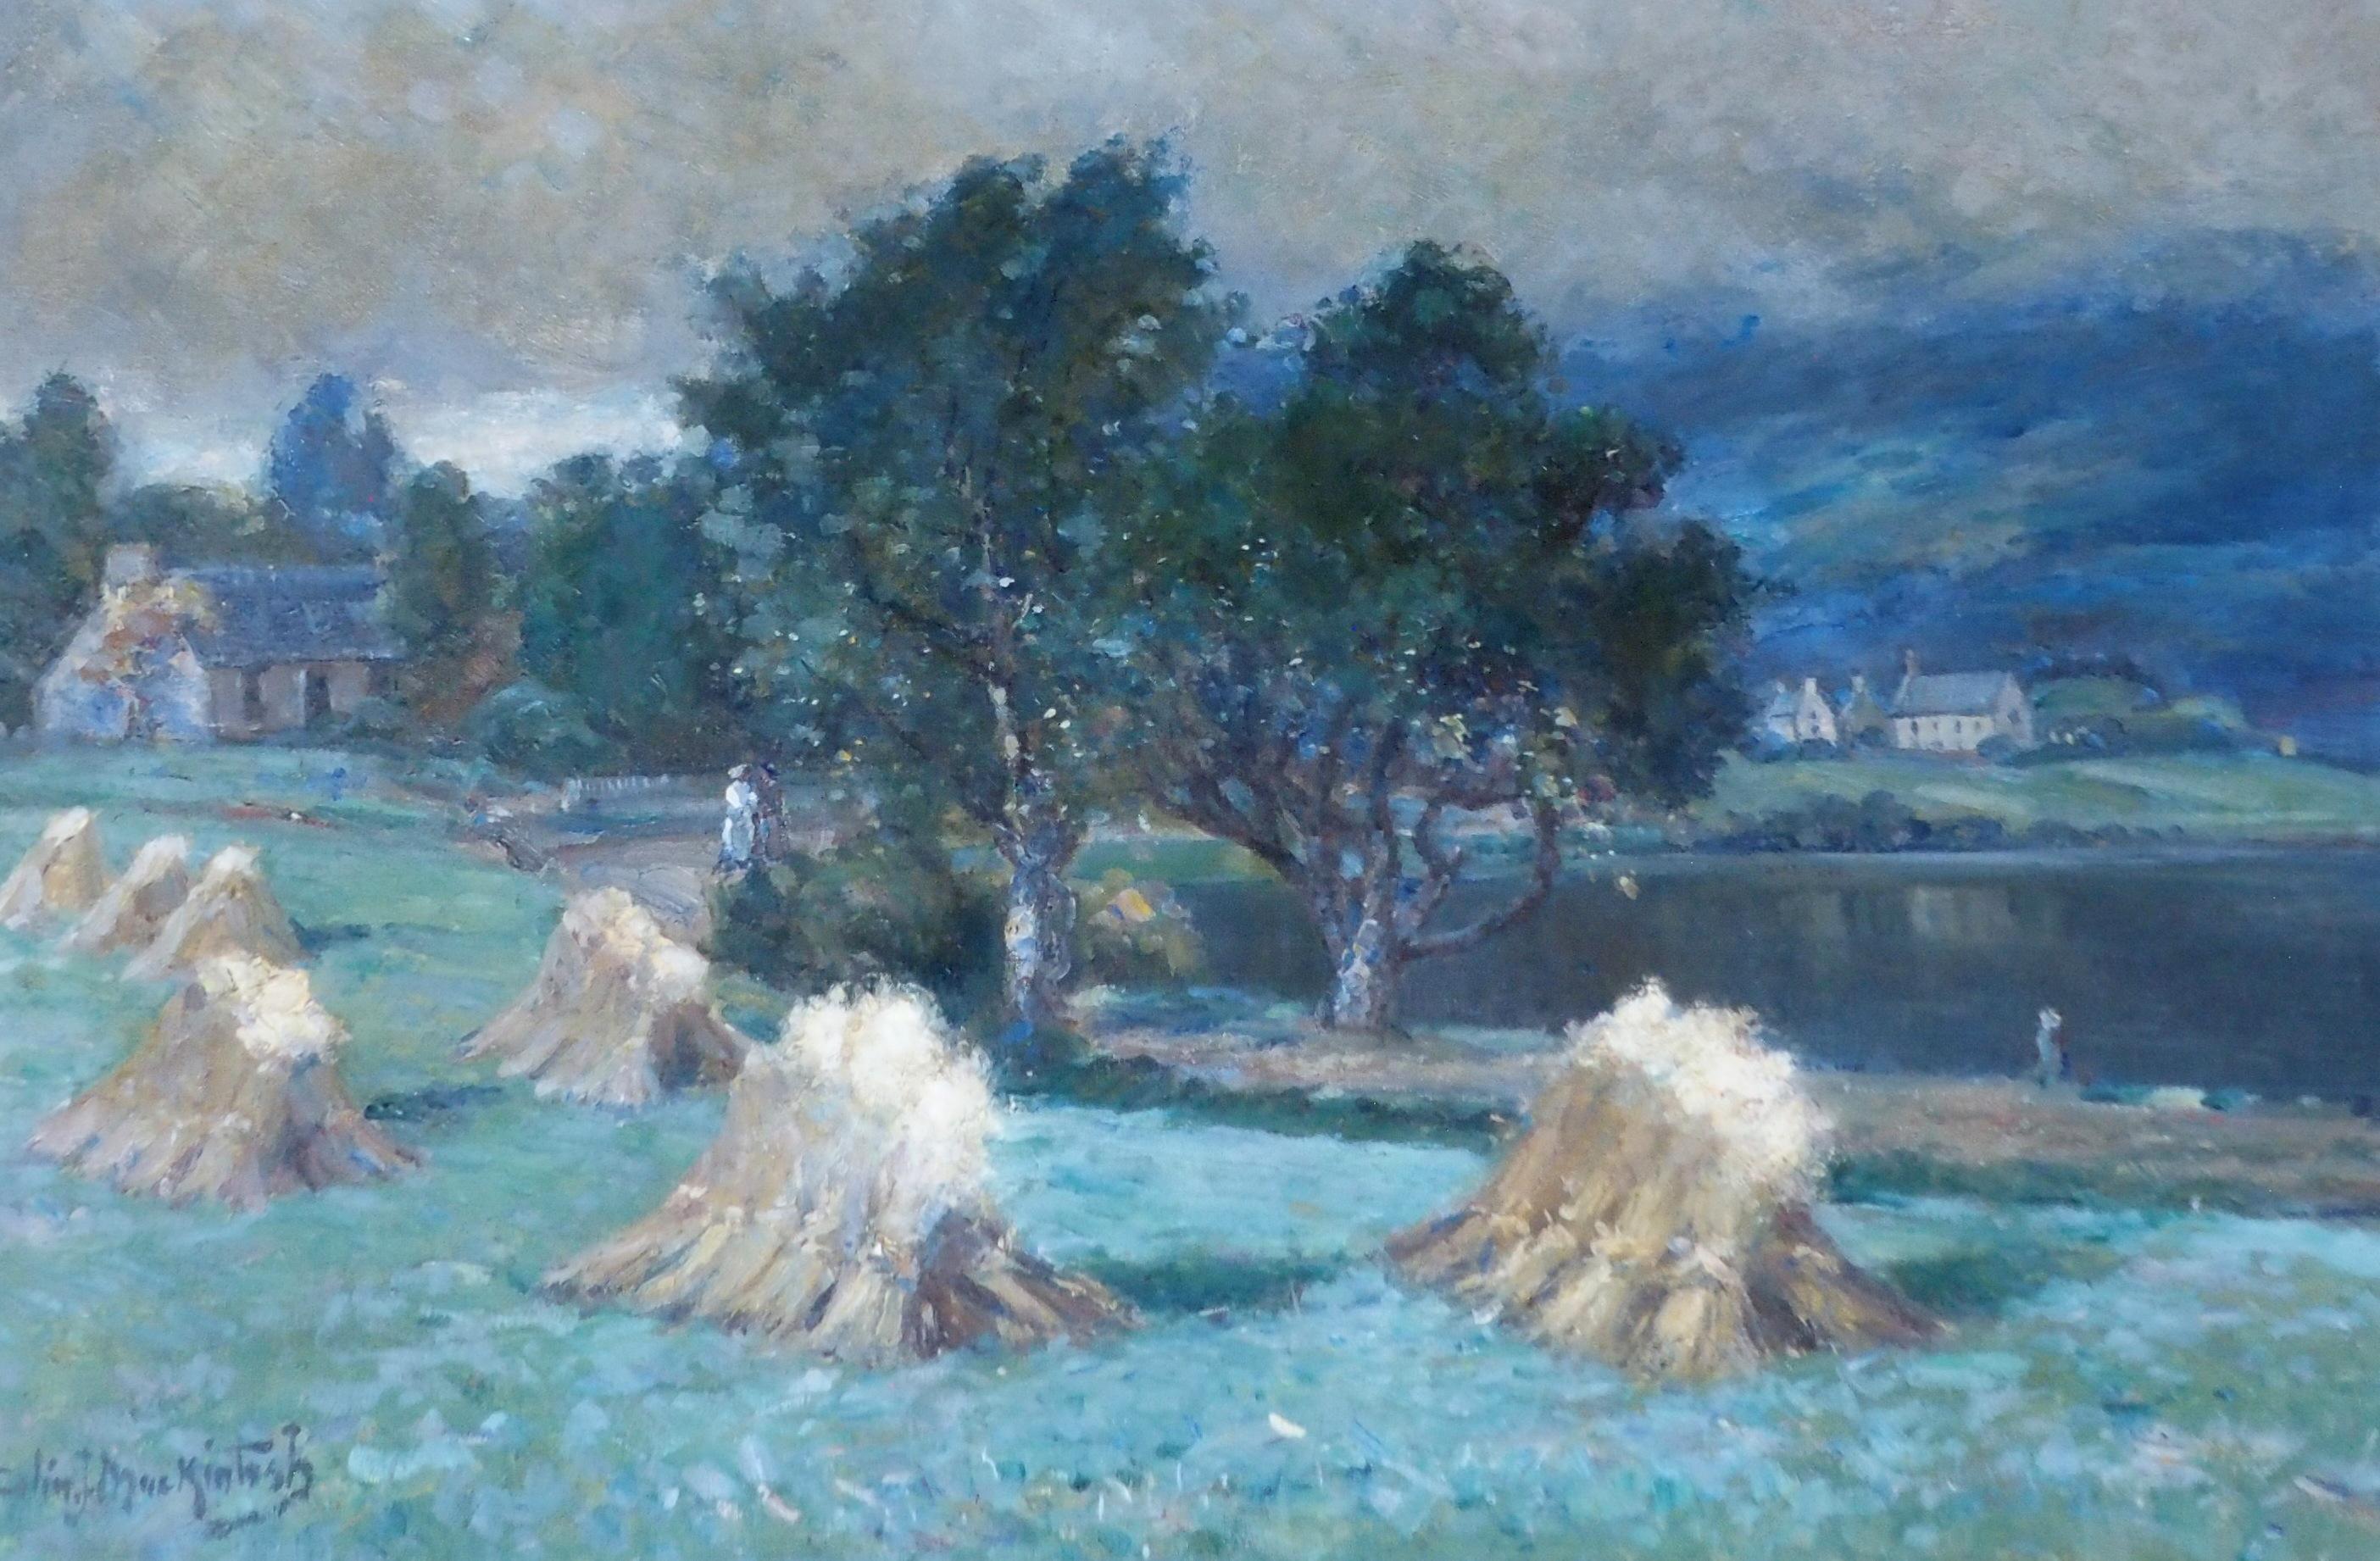 COLIN JOHN MACKINTOSH (SCOTTISH 1866-1910) CORN STOOKS, LOCH ALVIE Oil on canvas, signed, 61 x 91.